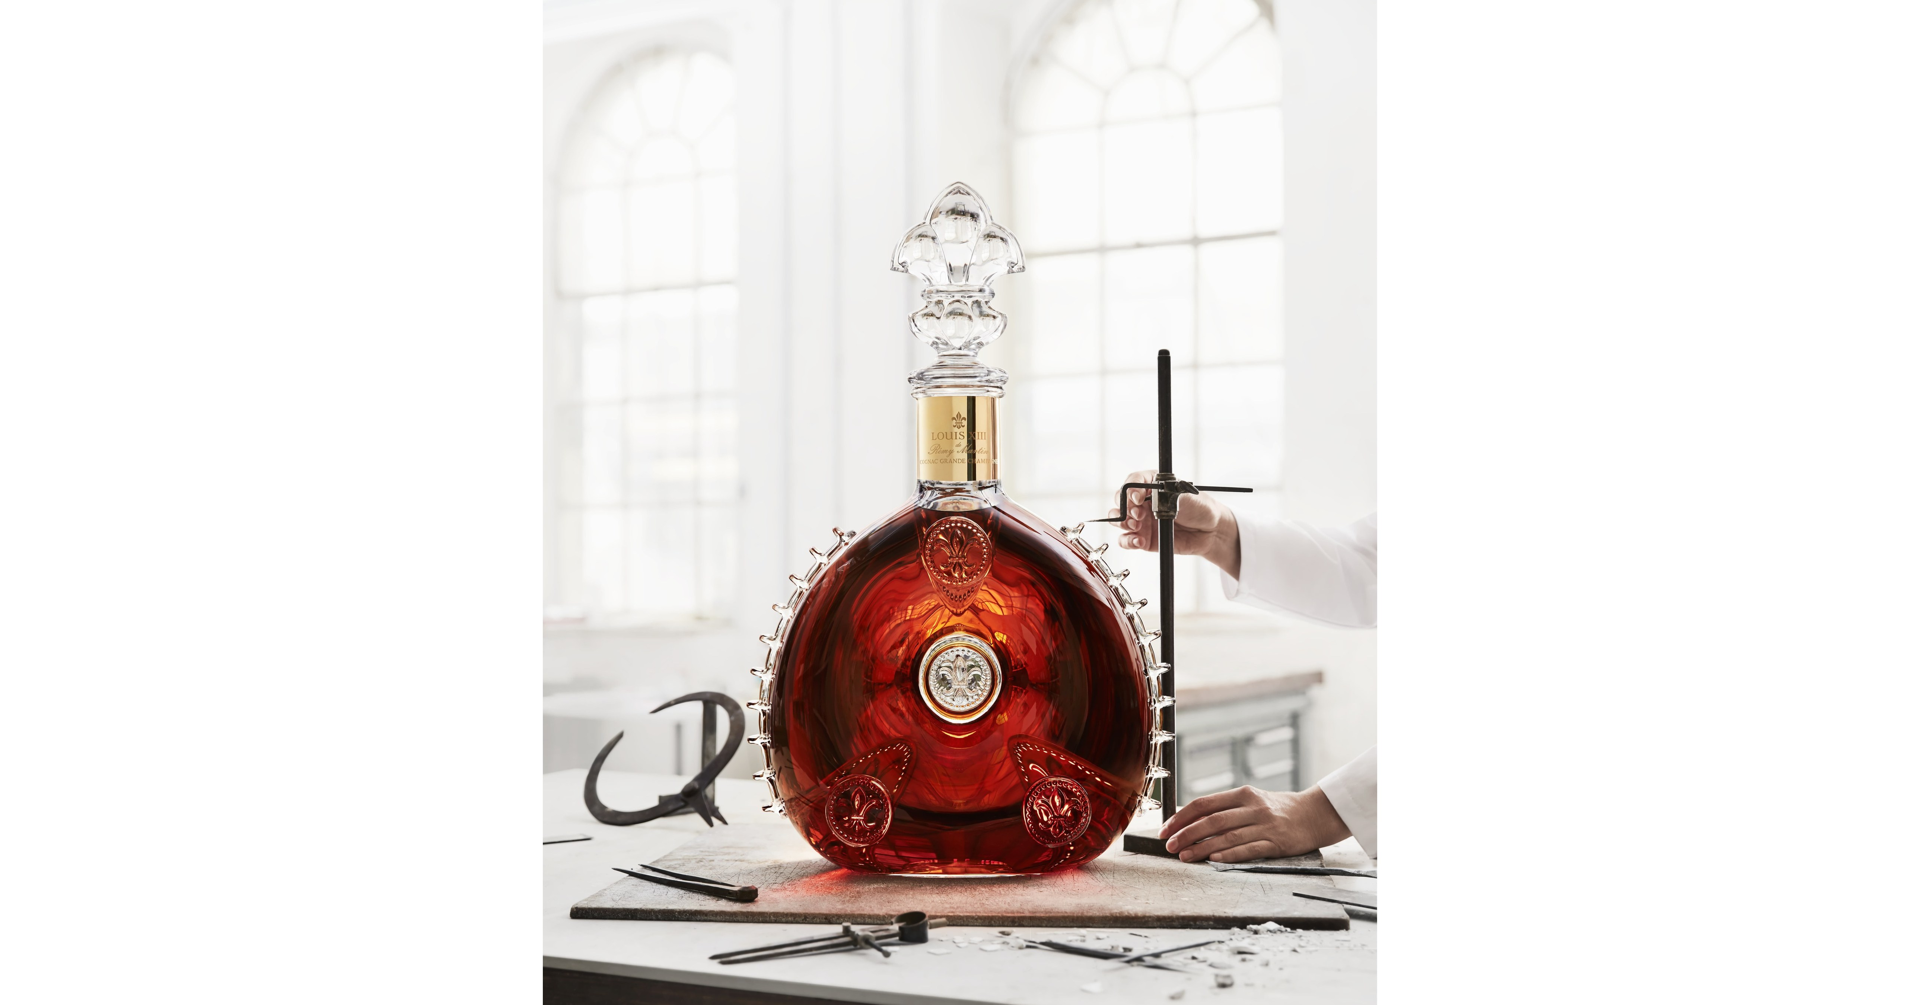 LOUIS XIII Le Salmanazar (© LOUIS XIII Cognac)